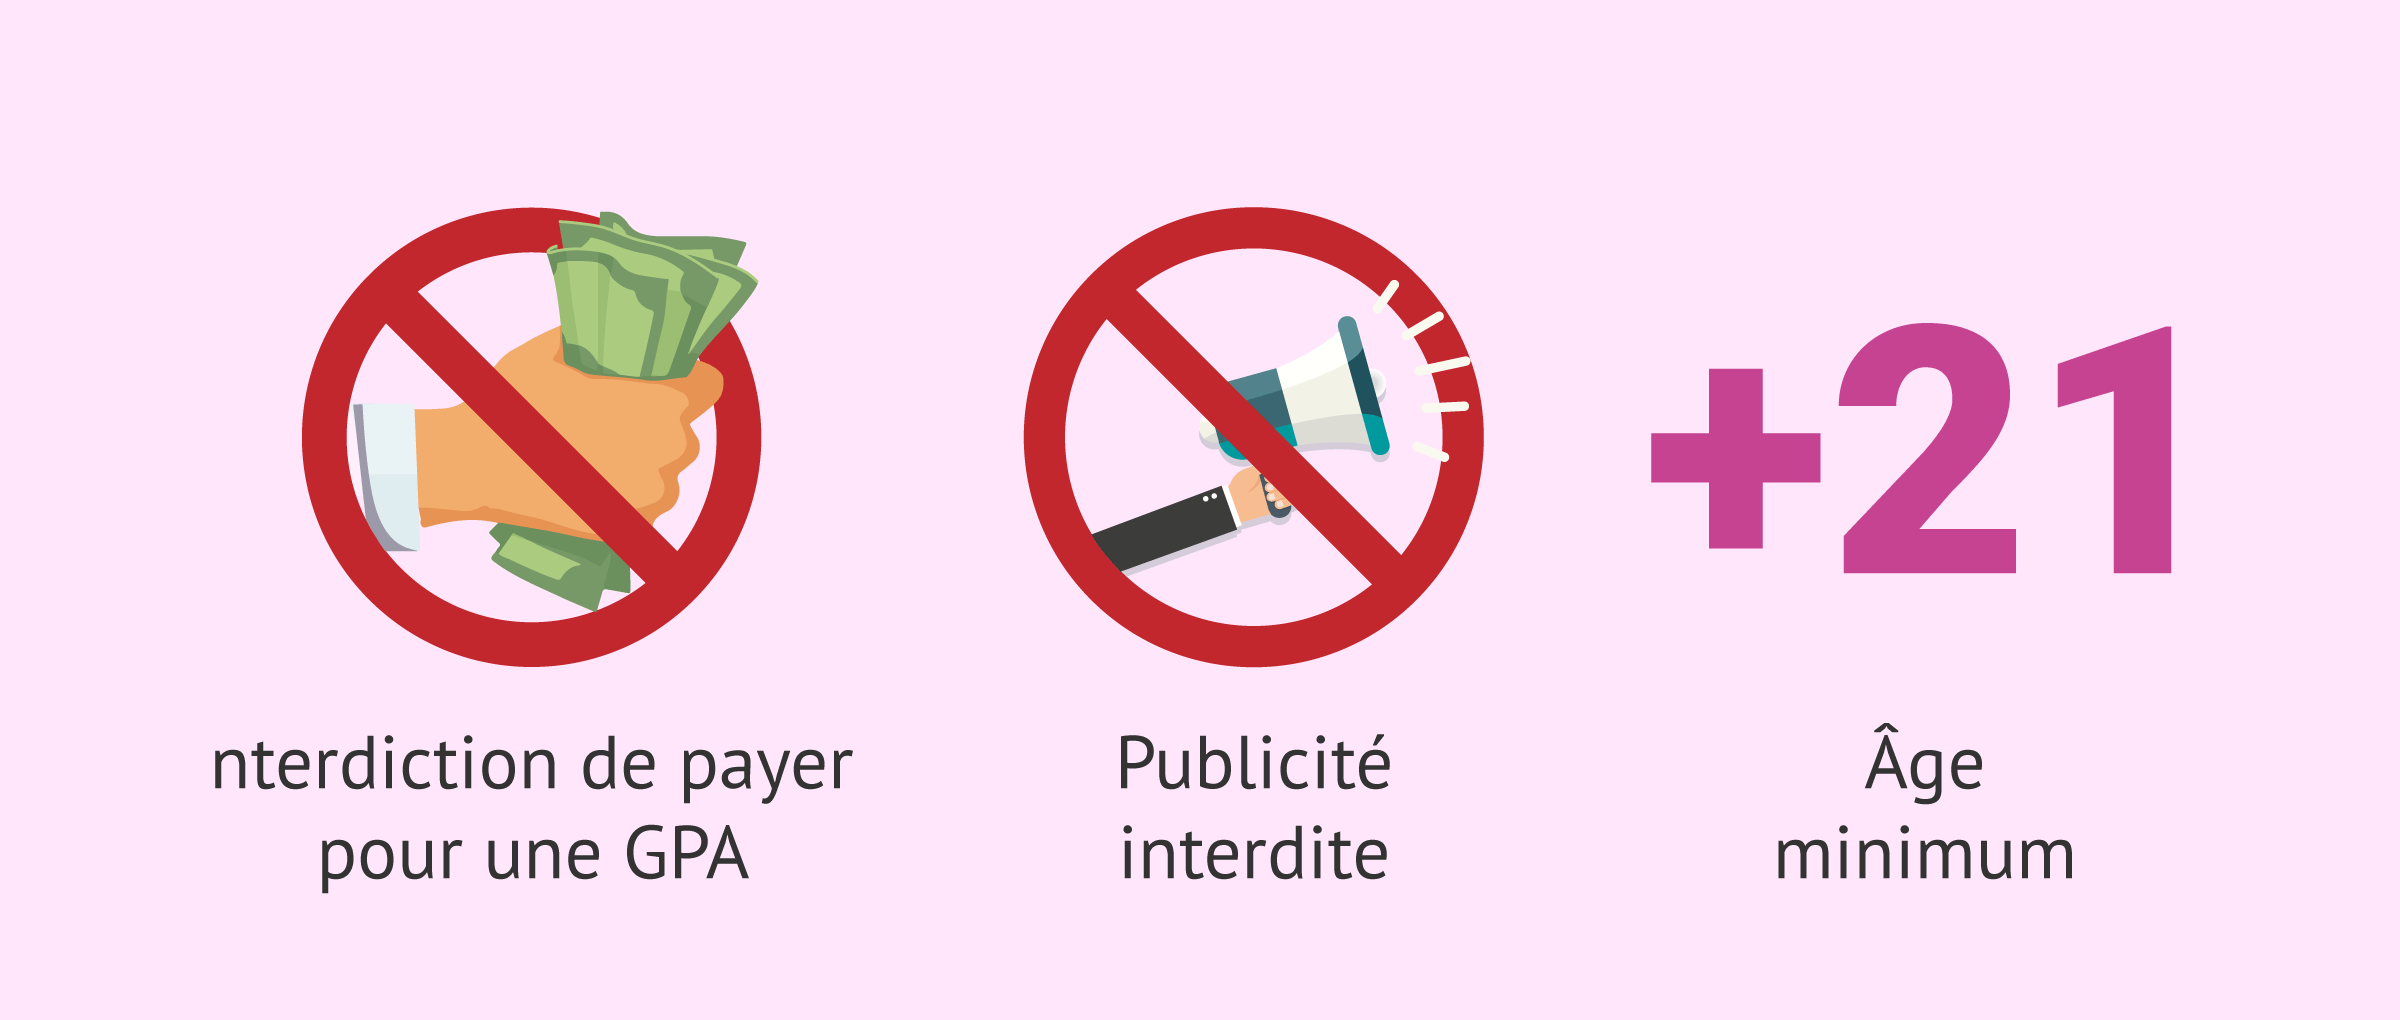 Interdictions dans la législation sur la GPA au Canada